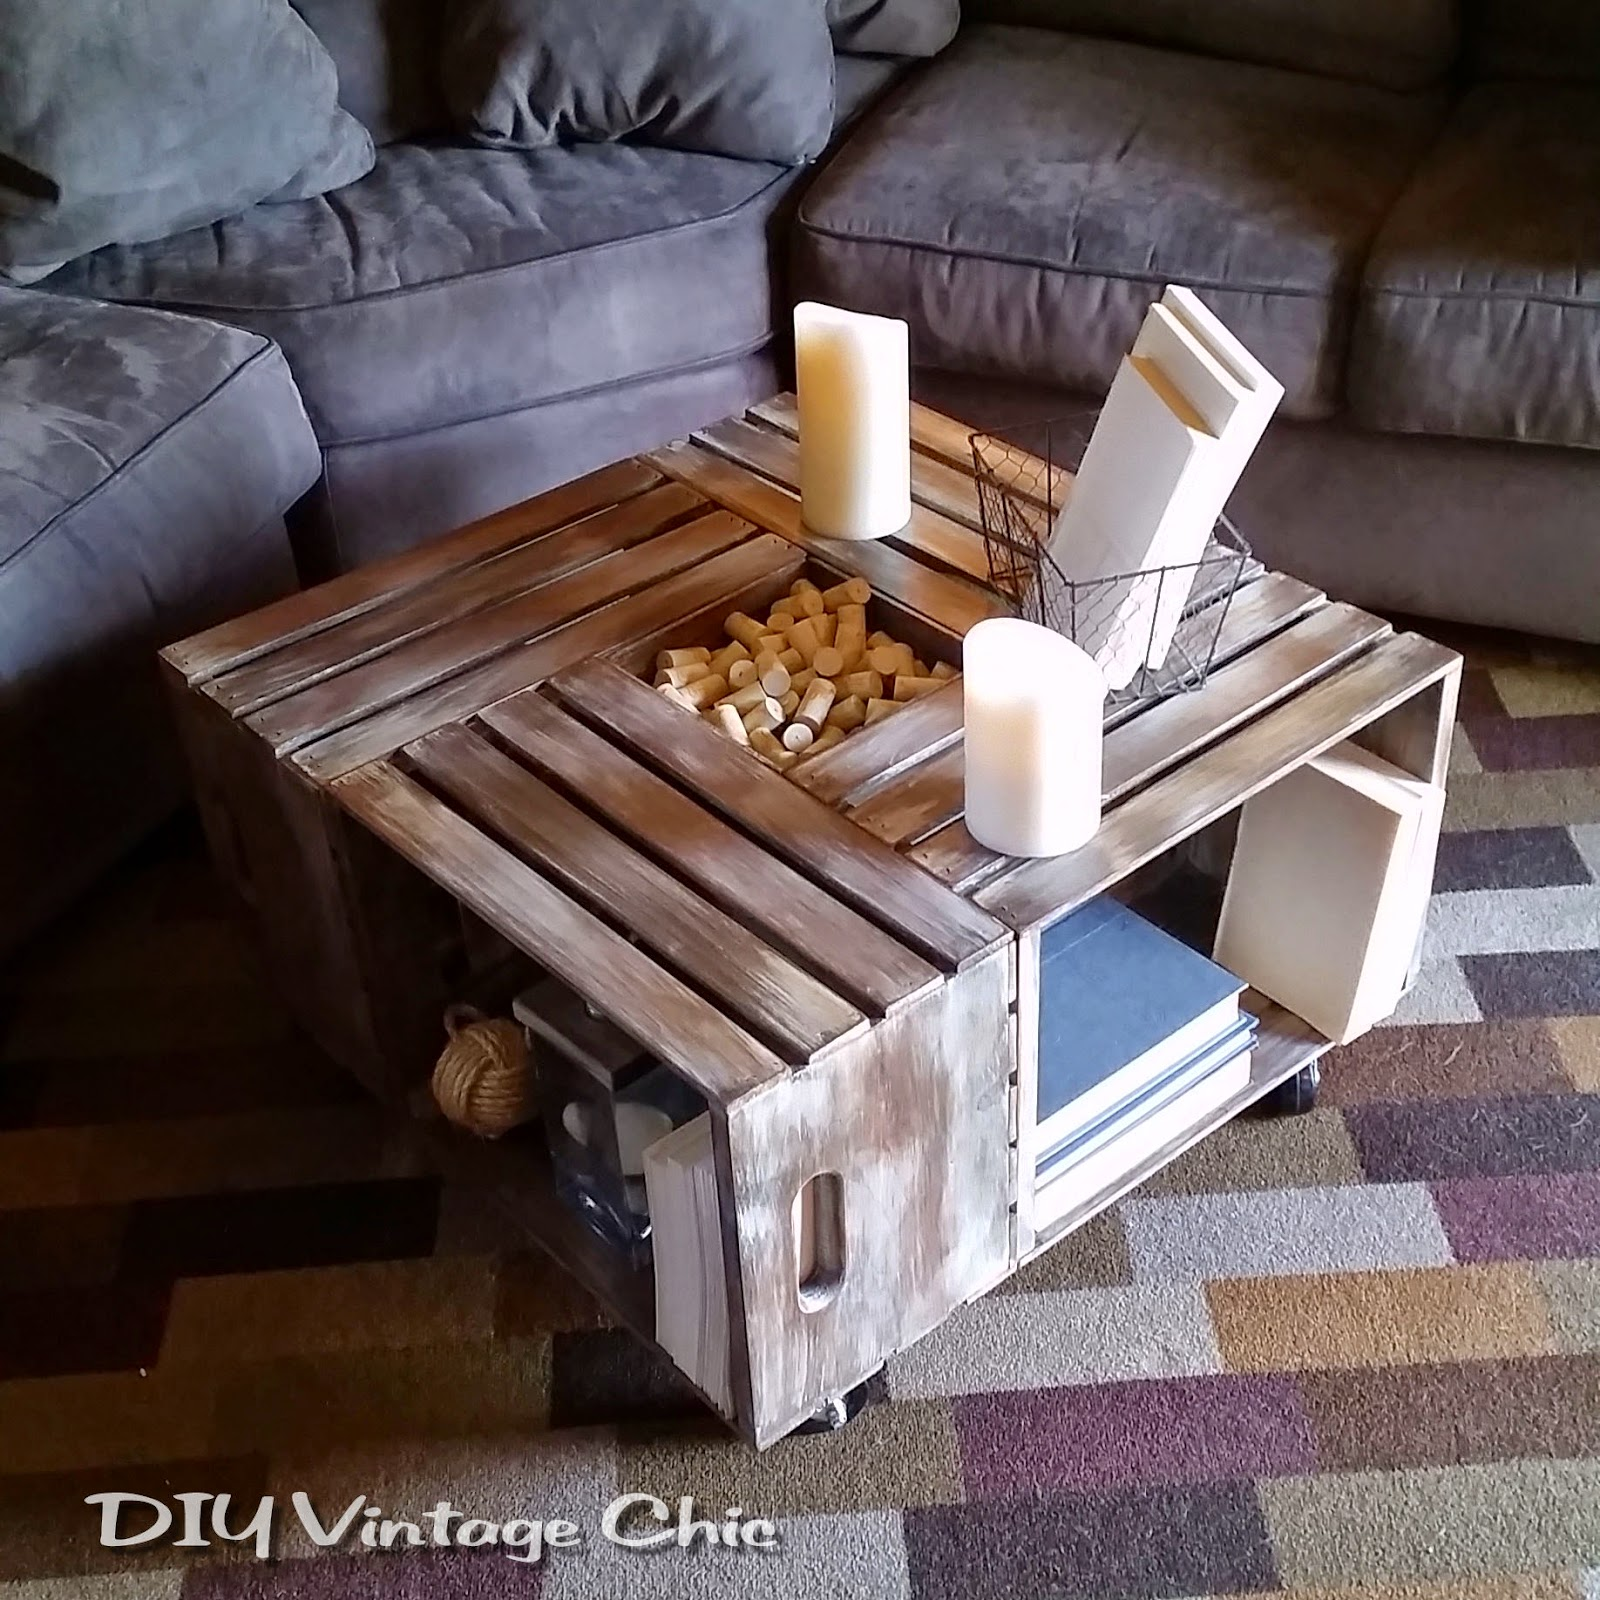 Diy Coffee Table: DIY Vintage Chic: DIY Vintage Wine Crate Coffee Table